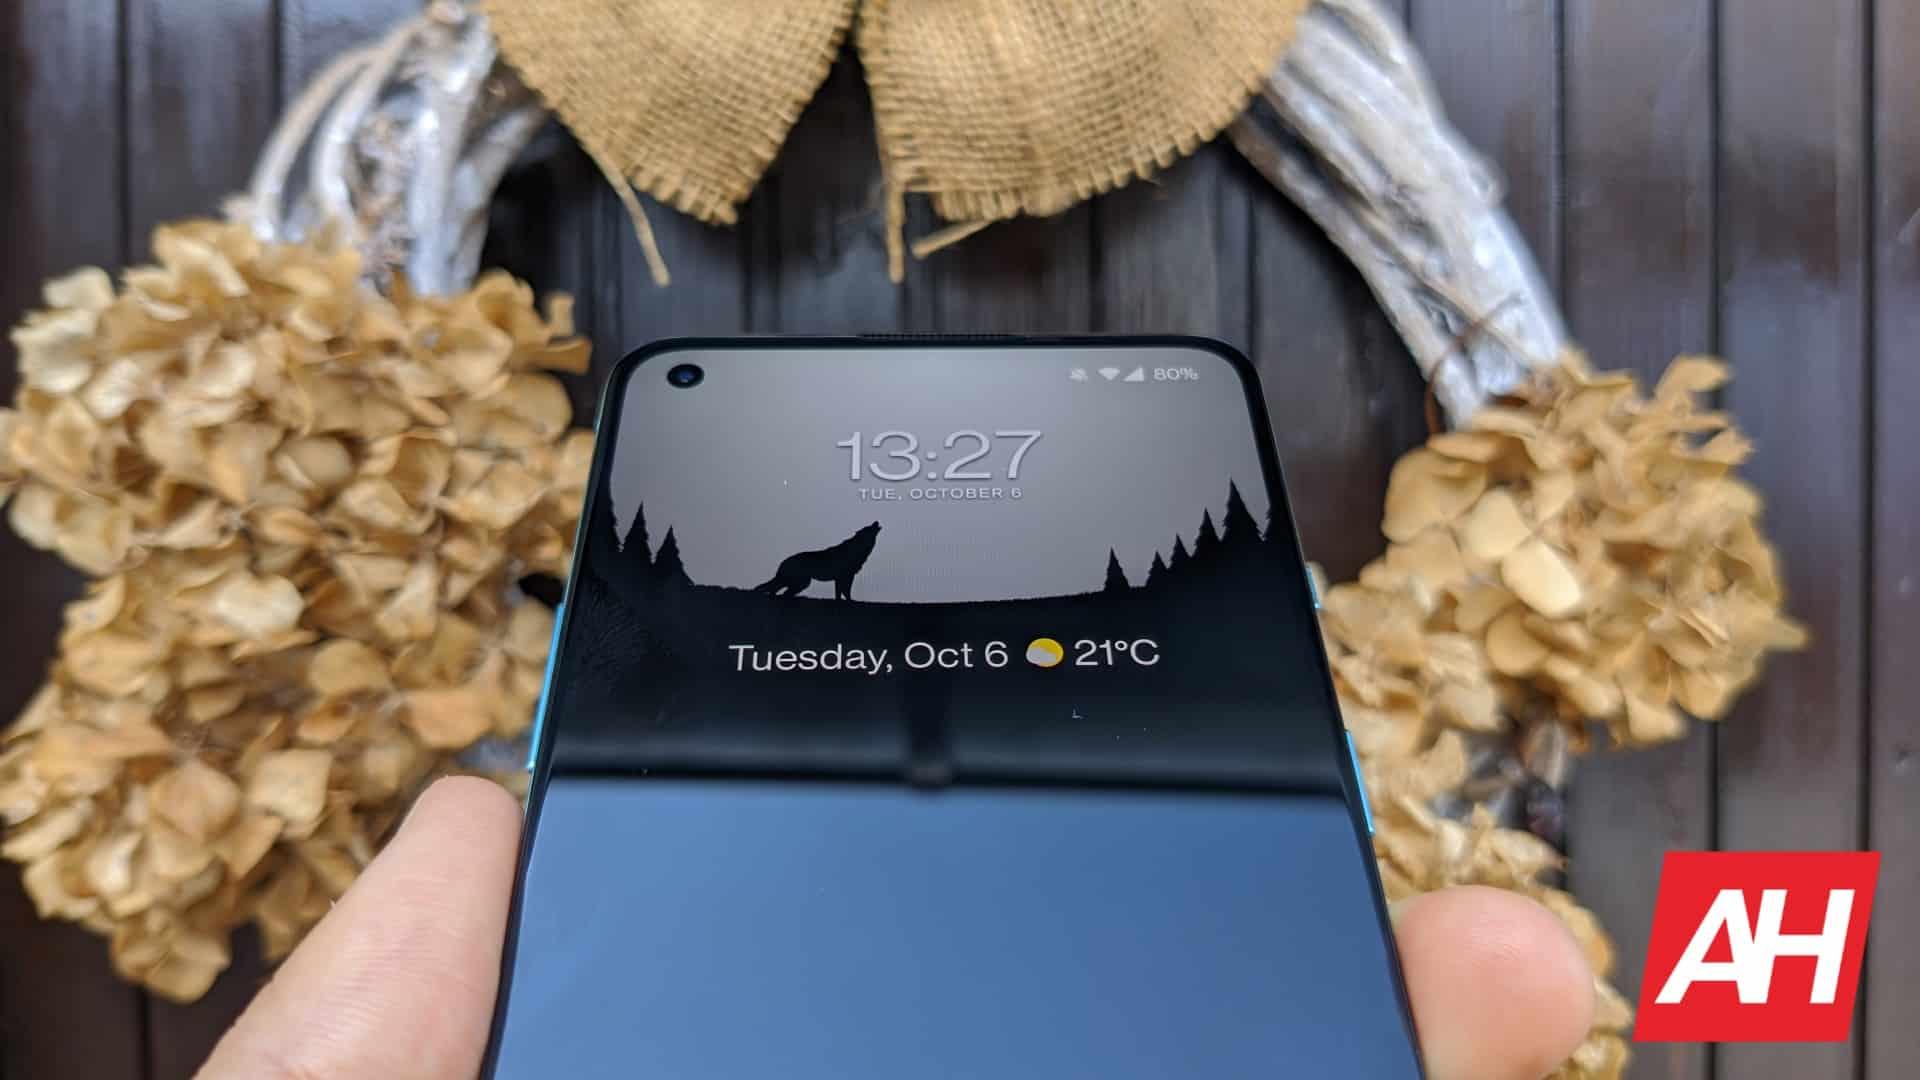 AH OnePlus 8T image 103